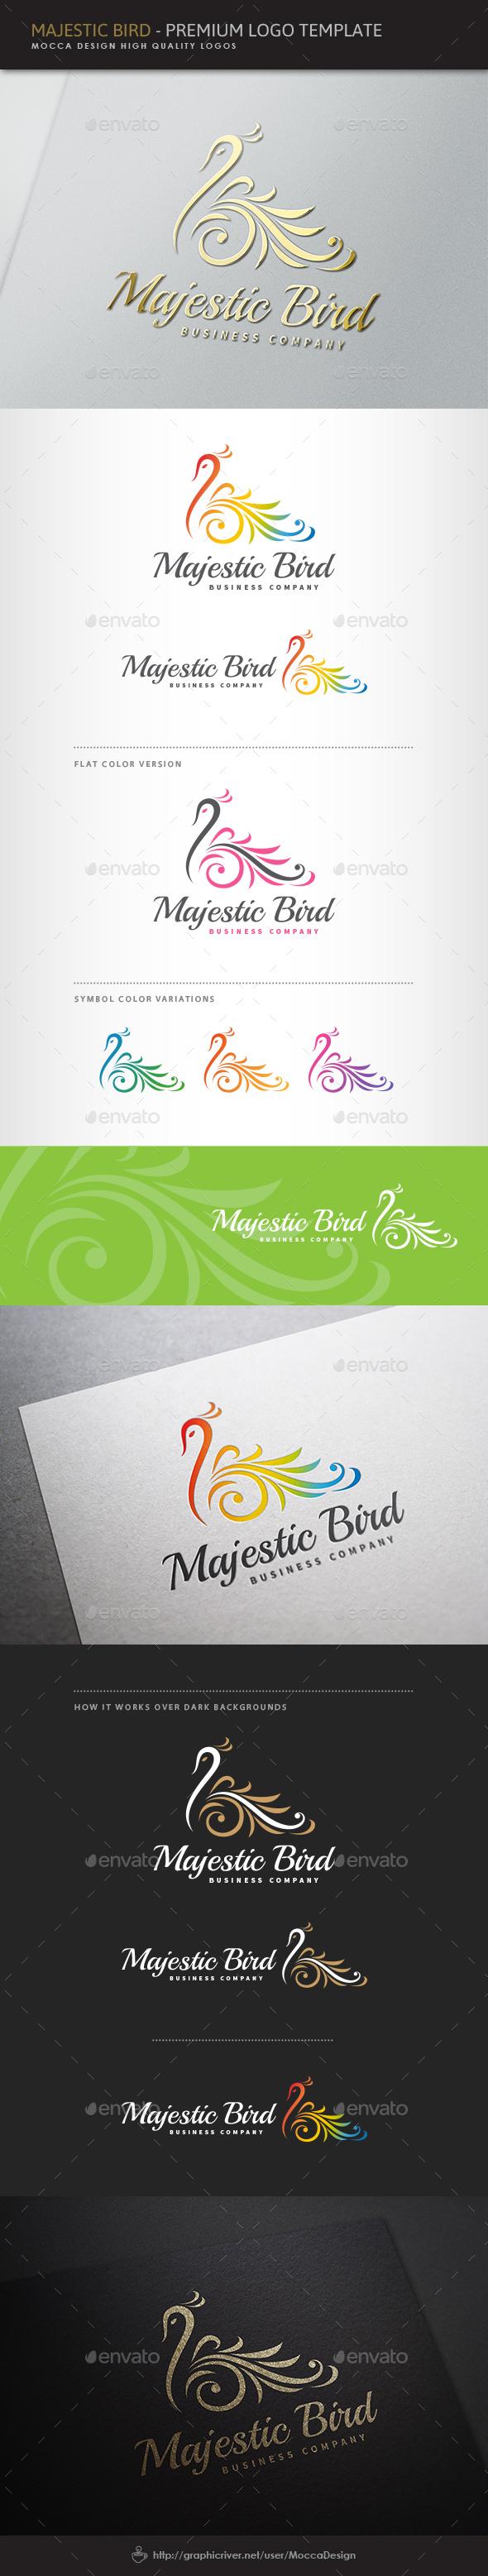 Majestic Bird Logo - Animals Logo Templates